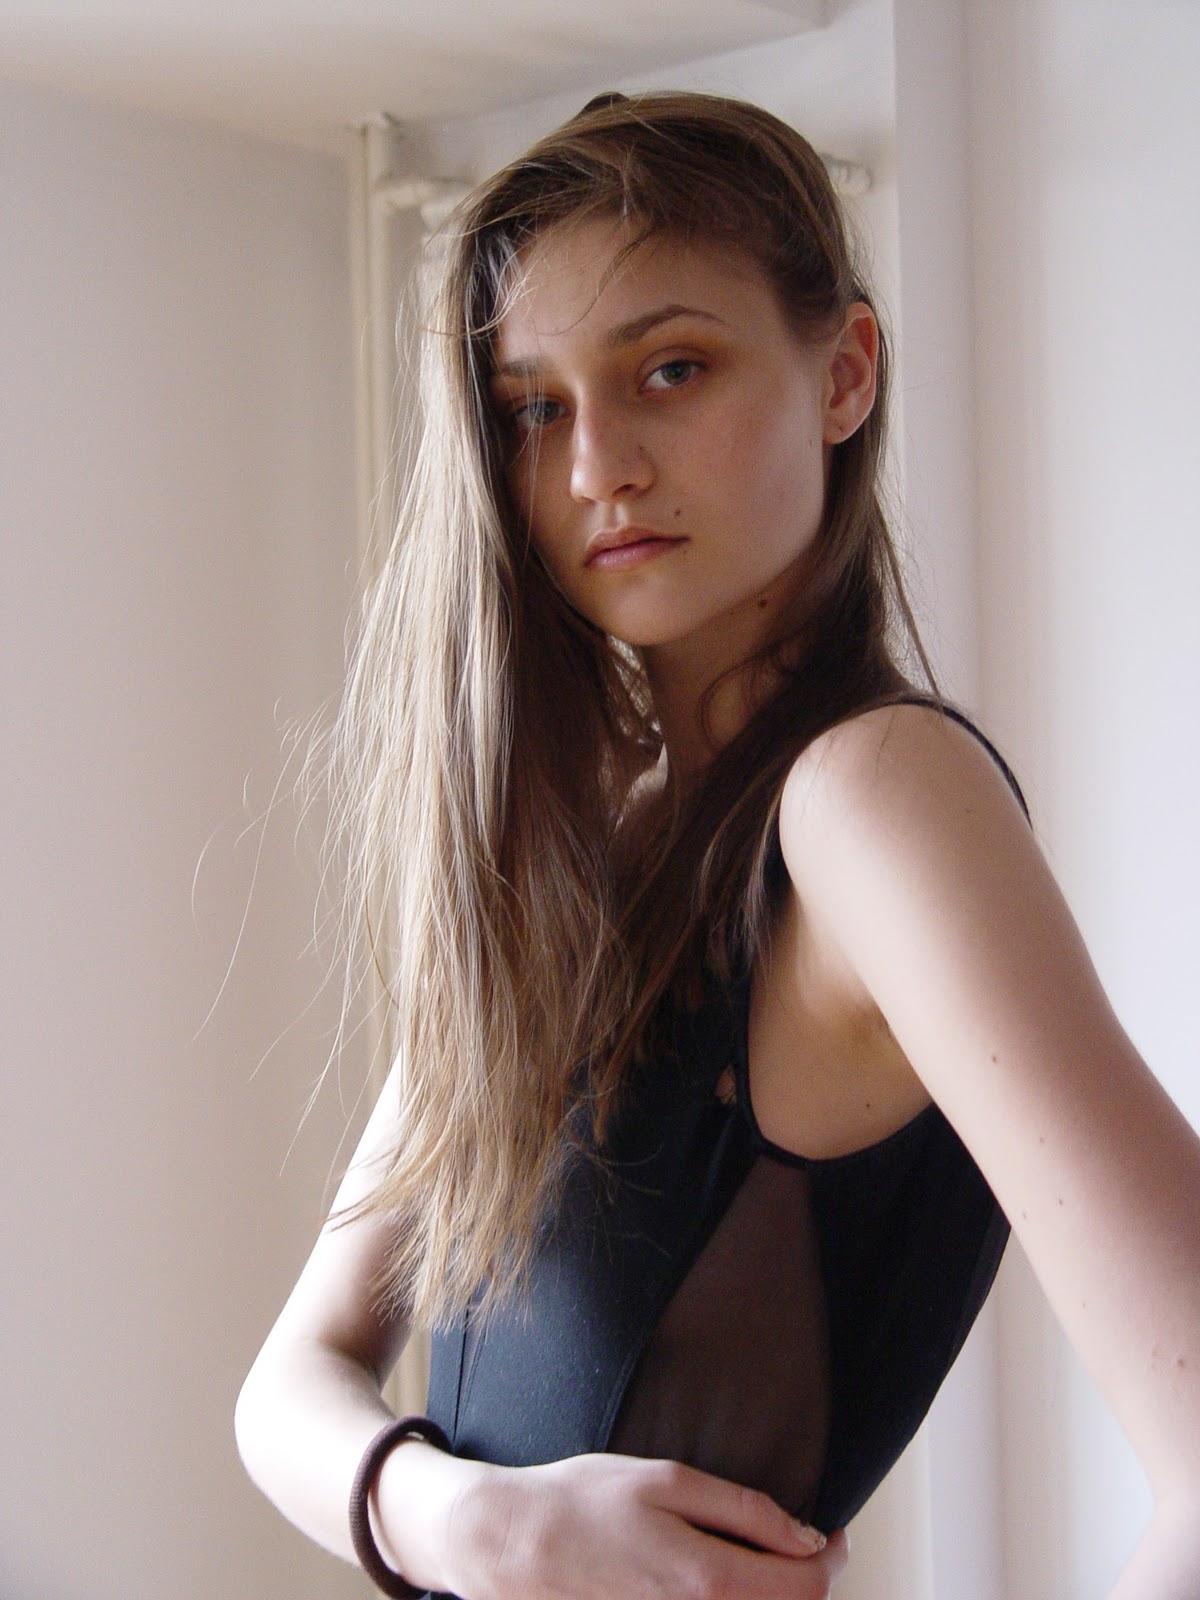 Pin on Teen Models